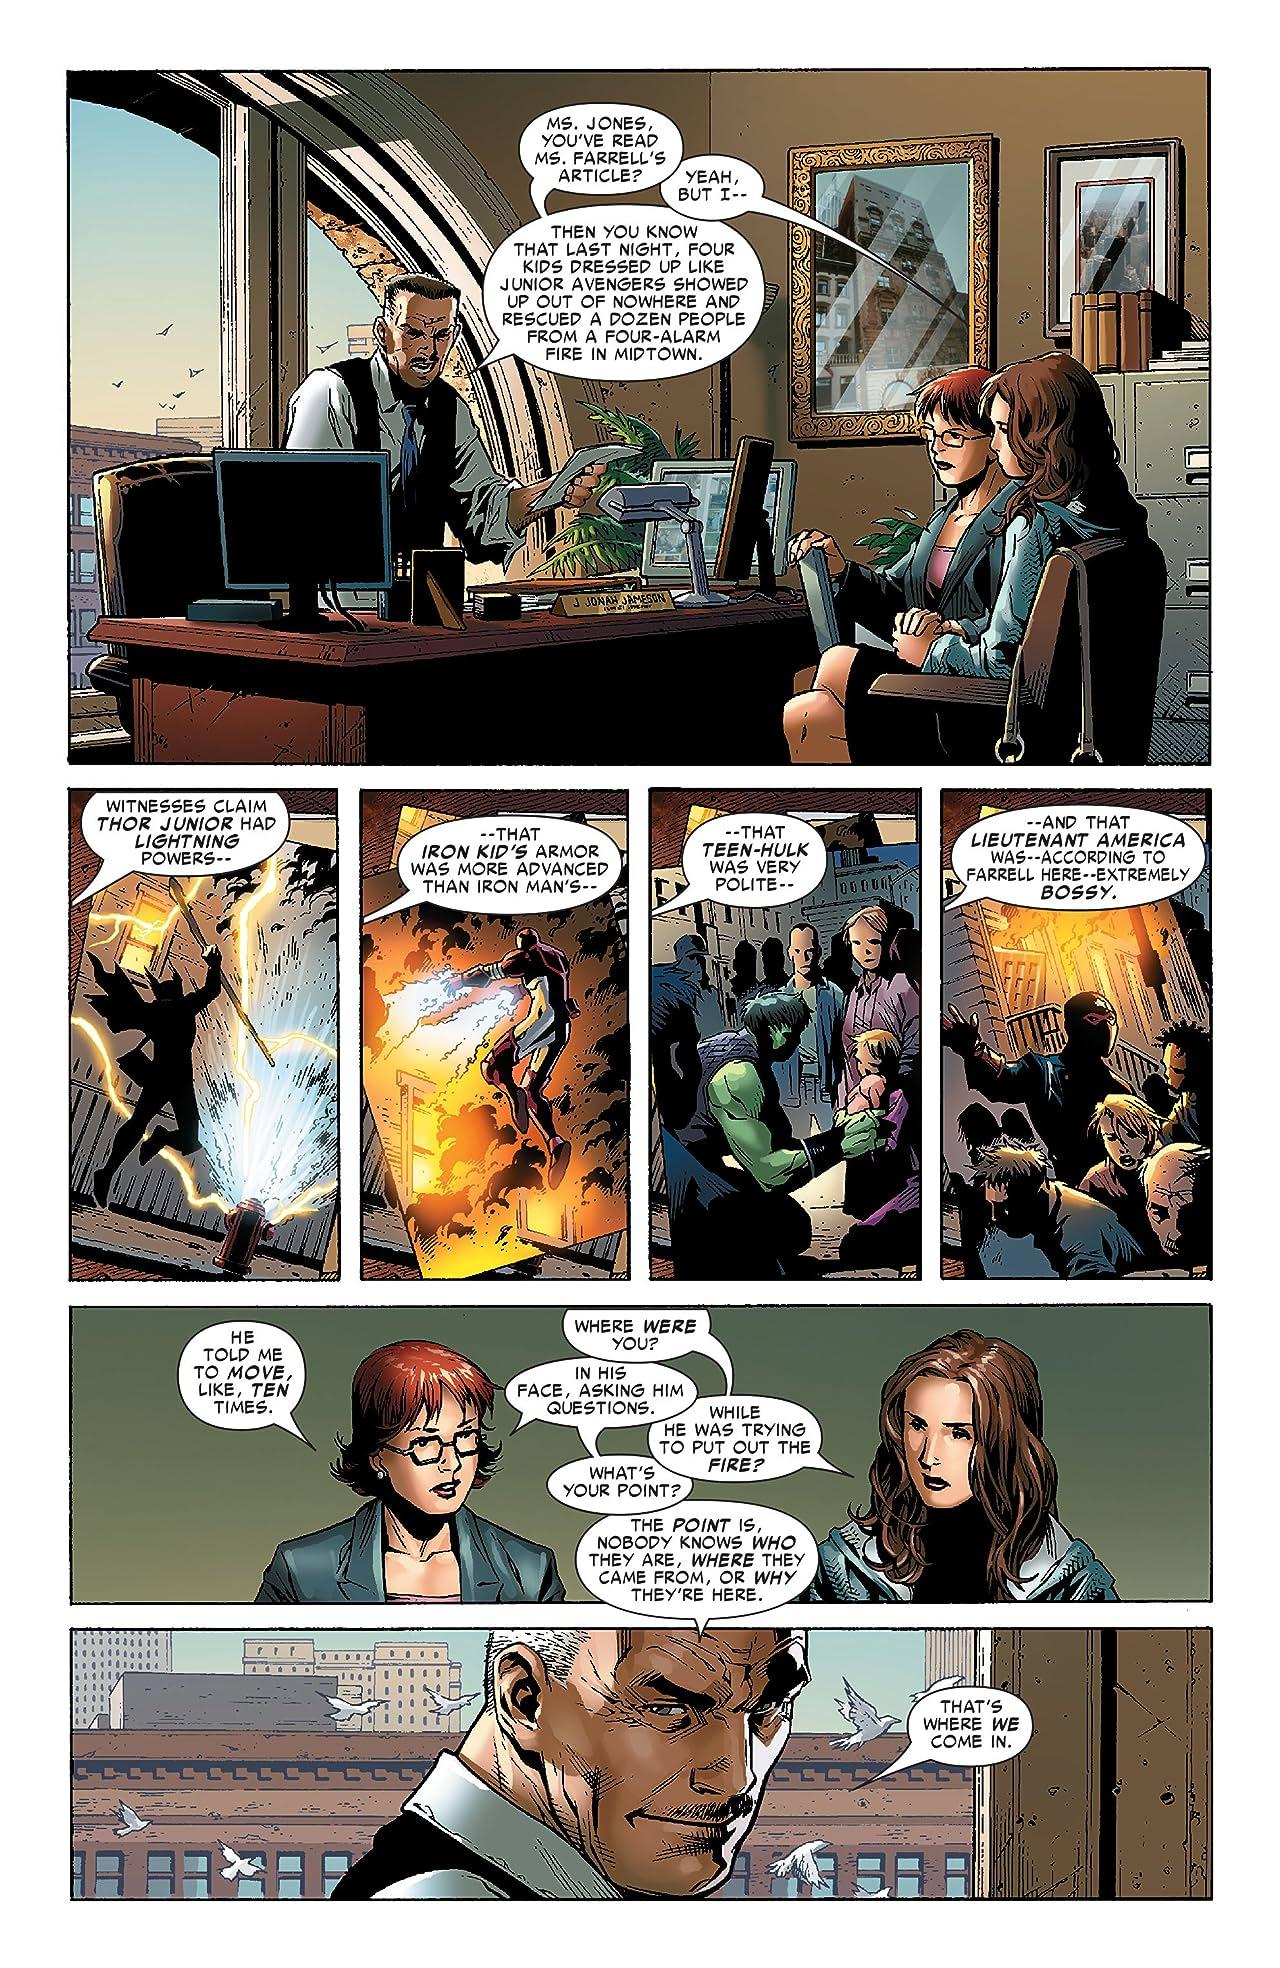 Young Avengers Vol. 1: Sidekicks